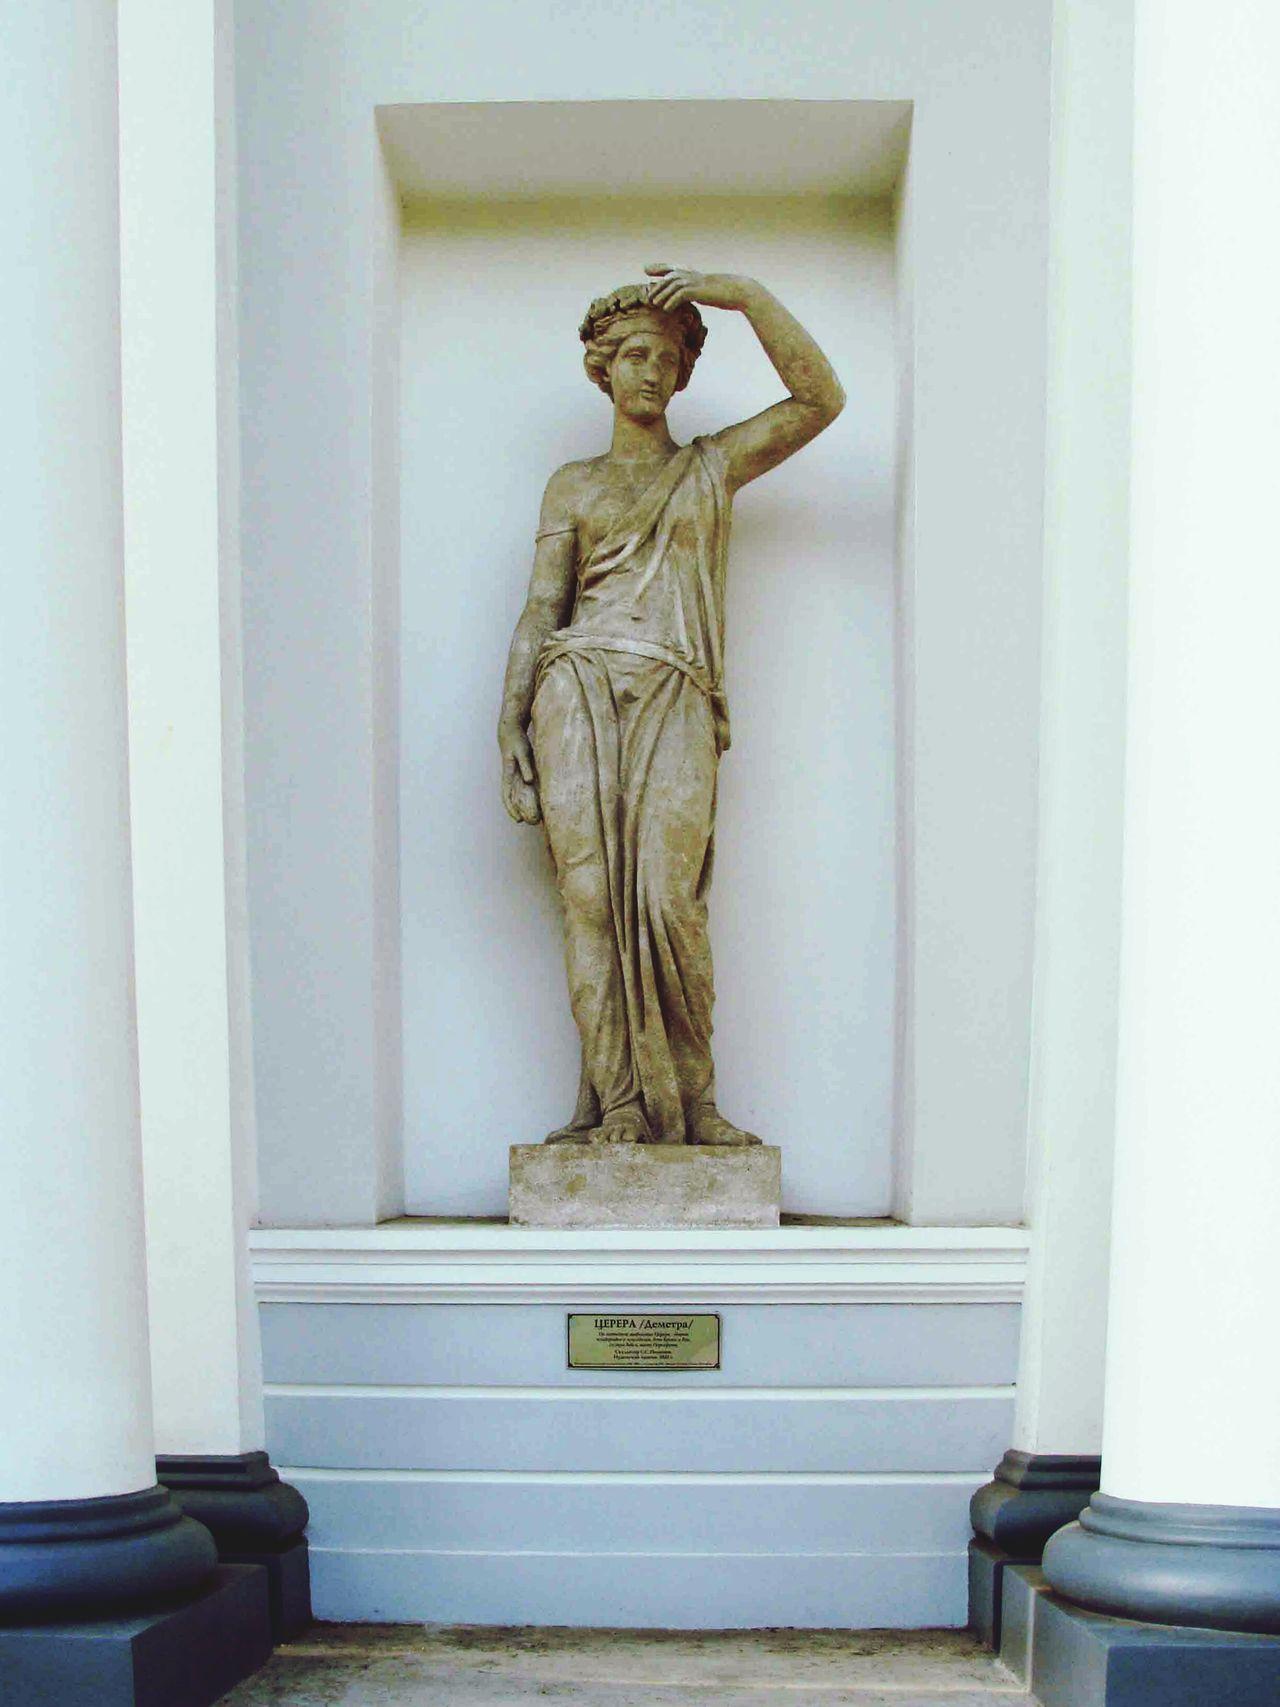 Taking Photos Saint Petersburg Russia Eyeemphotography Photography Greek Mythology Elagin Island Park Sculpture